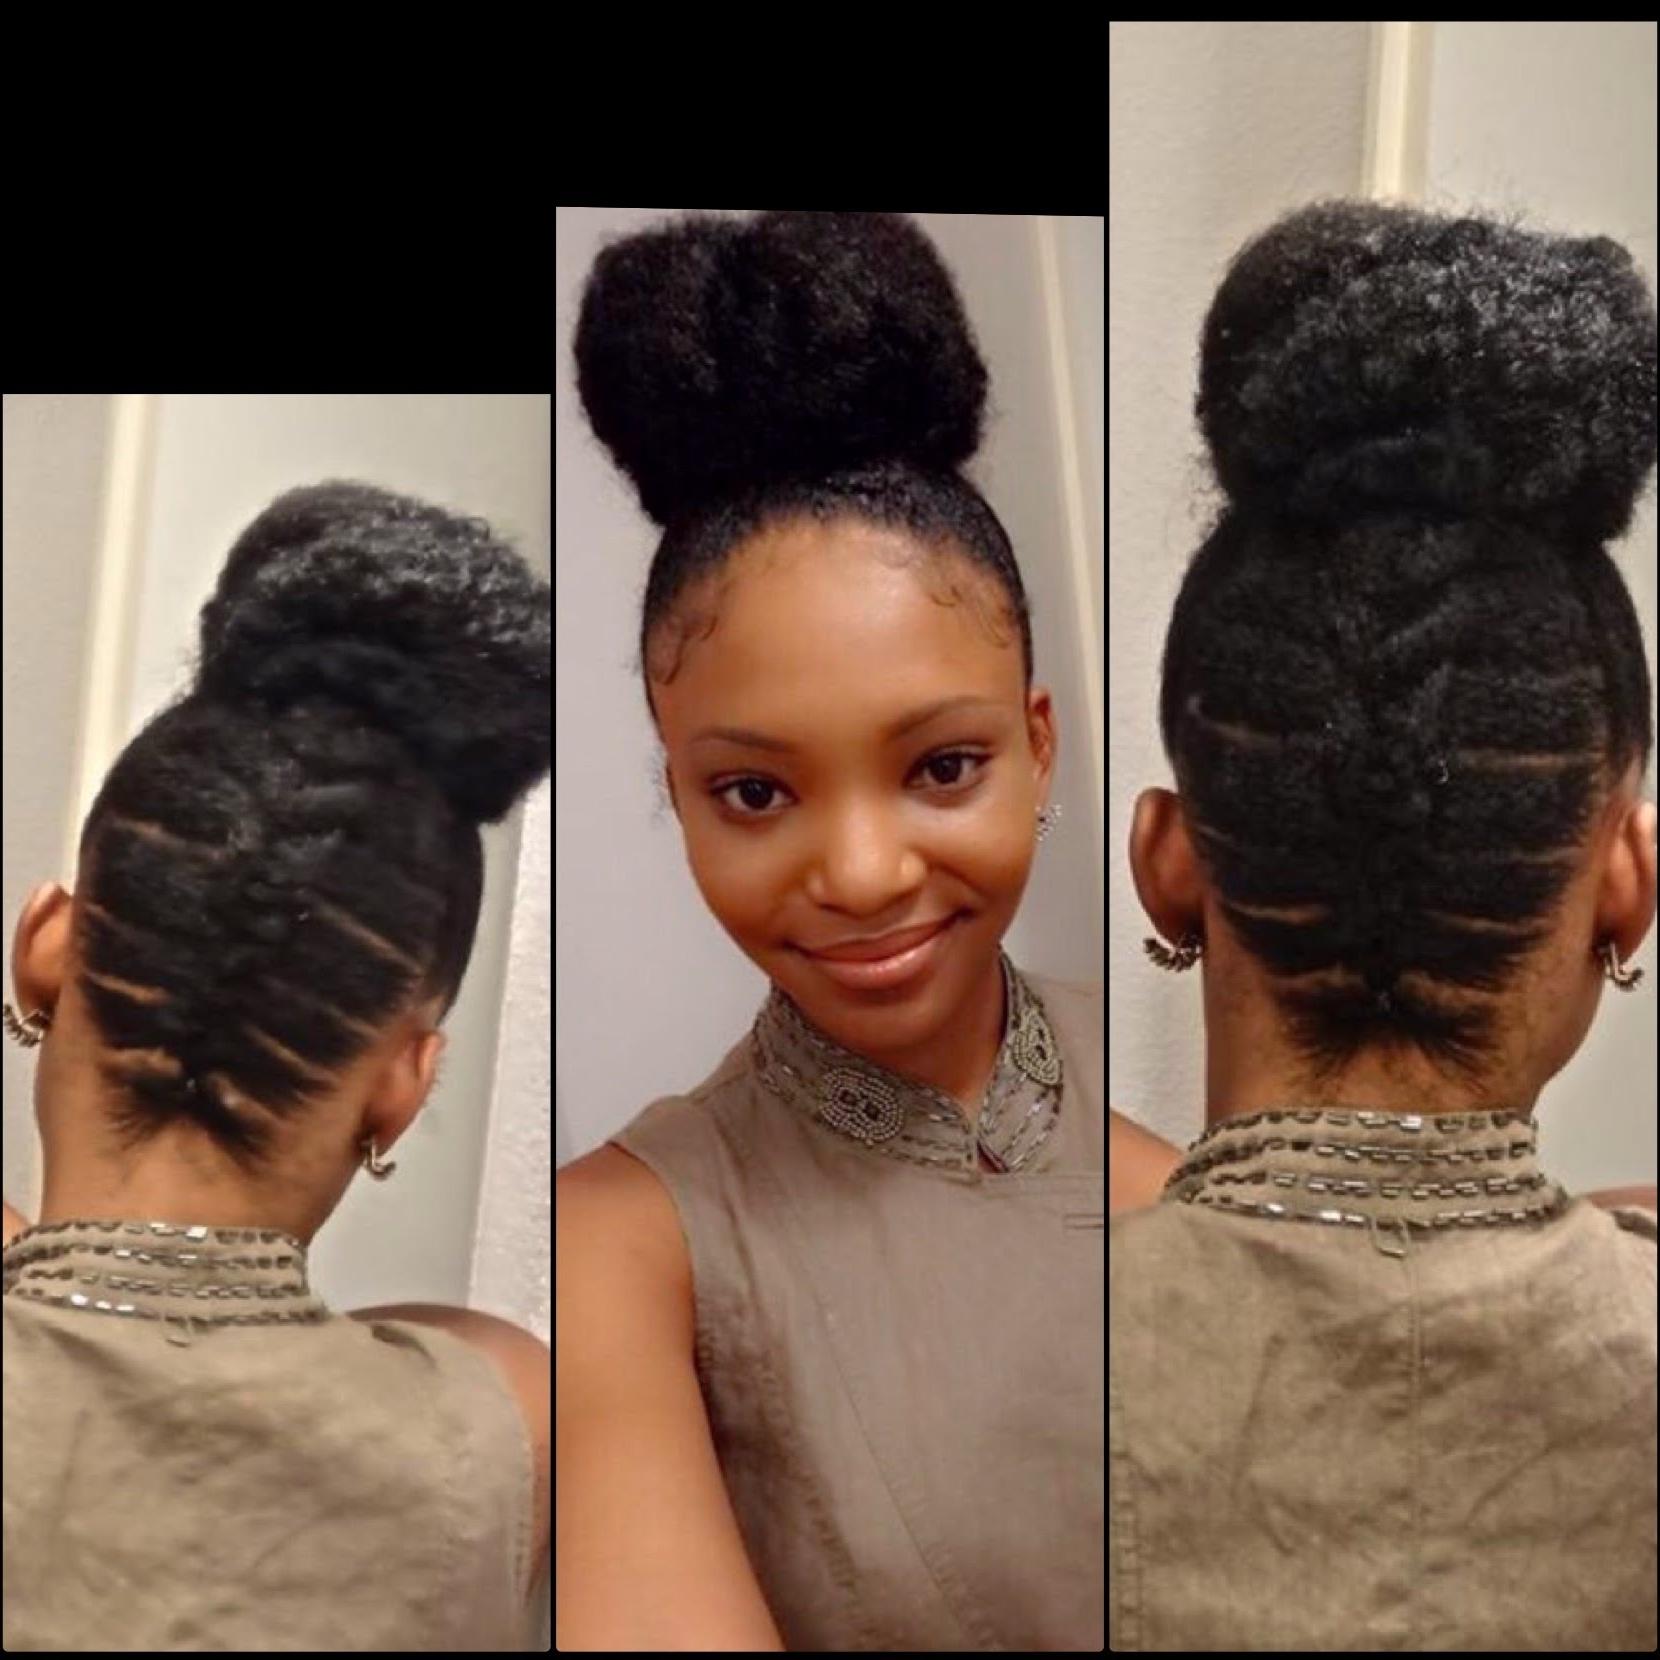 Best Solutions Of Cornrow Updo Hairstyles For Black Women Fancy Regarding Cornrow Updo Hairstyles For Black Women (View 3 of 15)